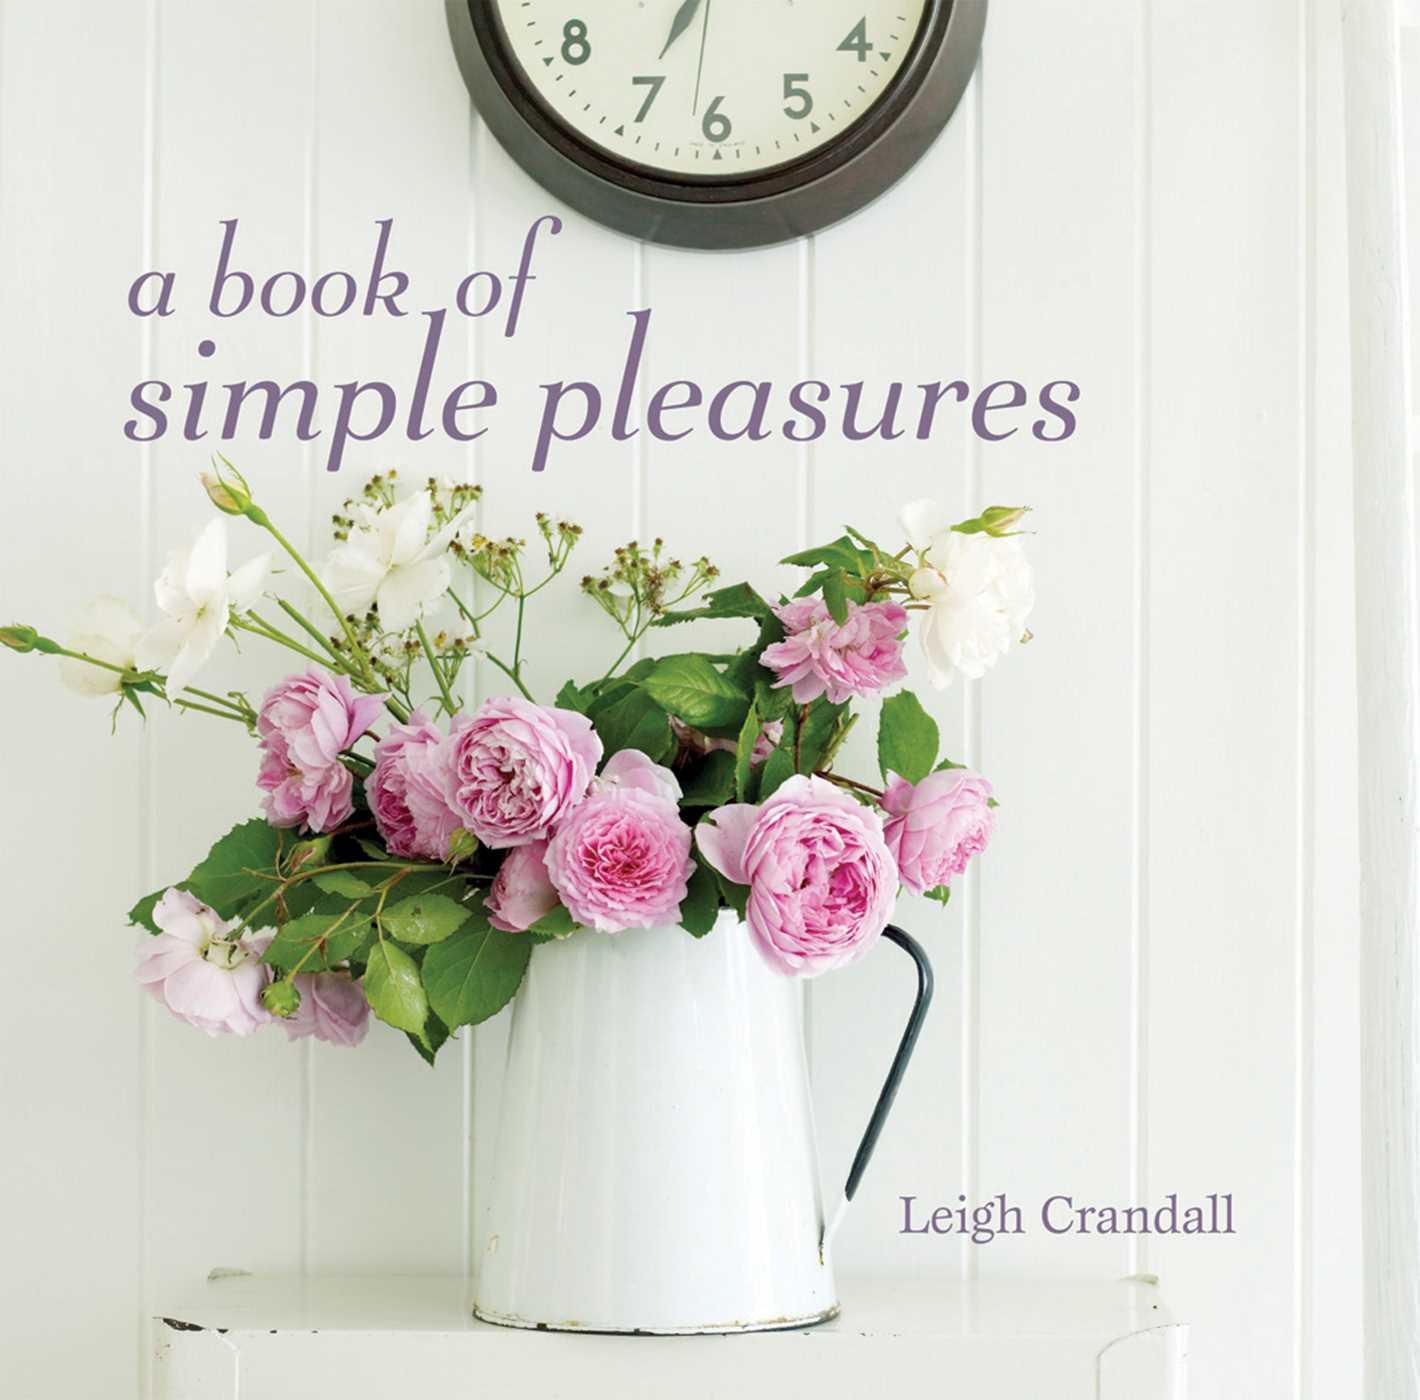 A book of simple pleasures 9781849751391 hr